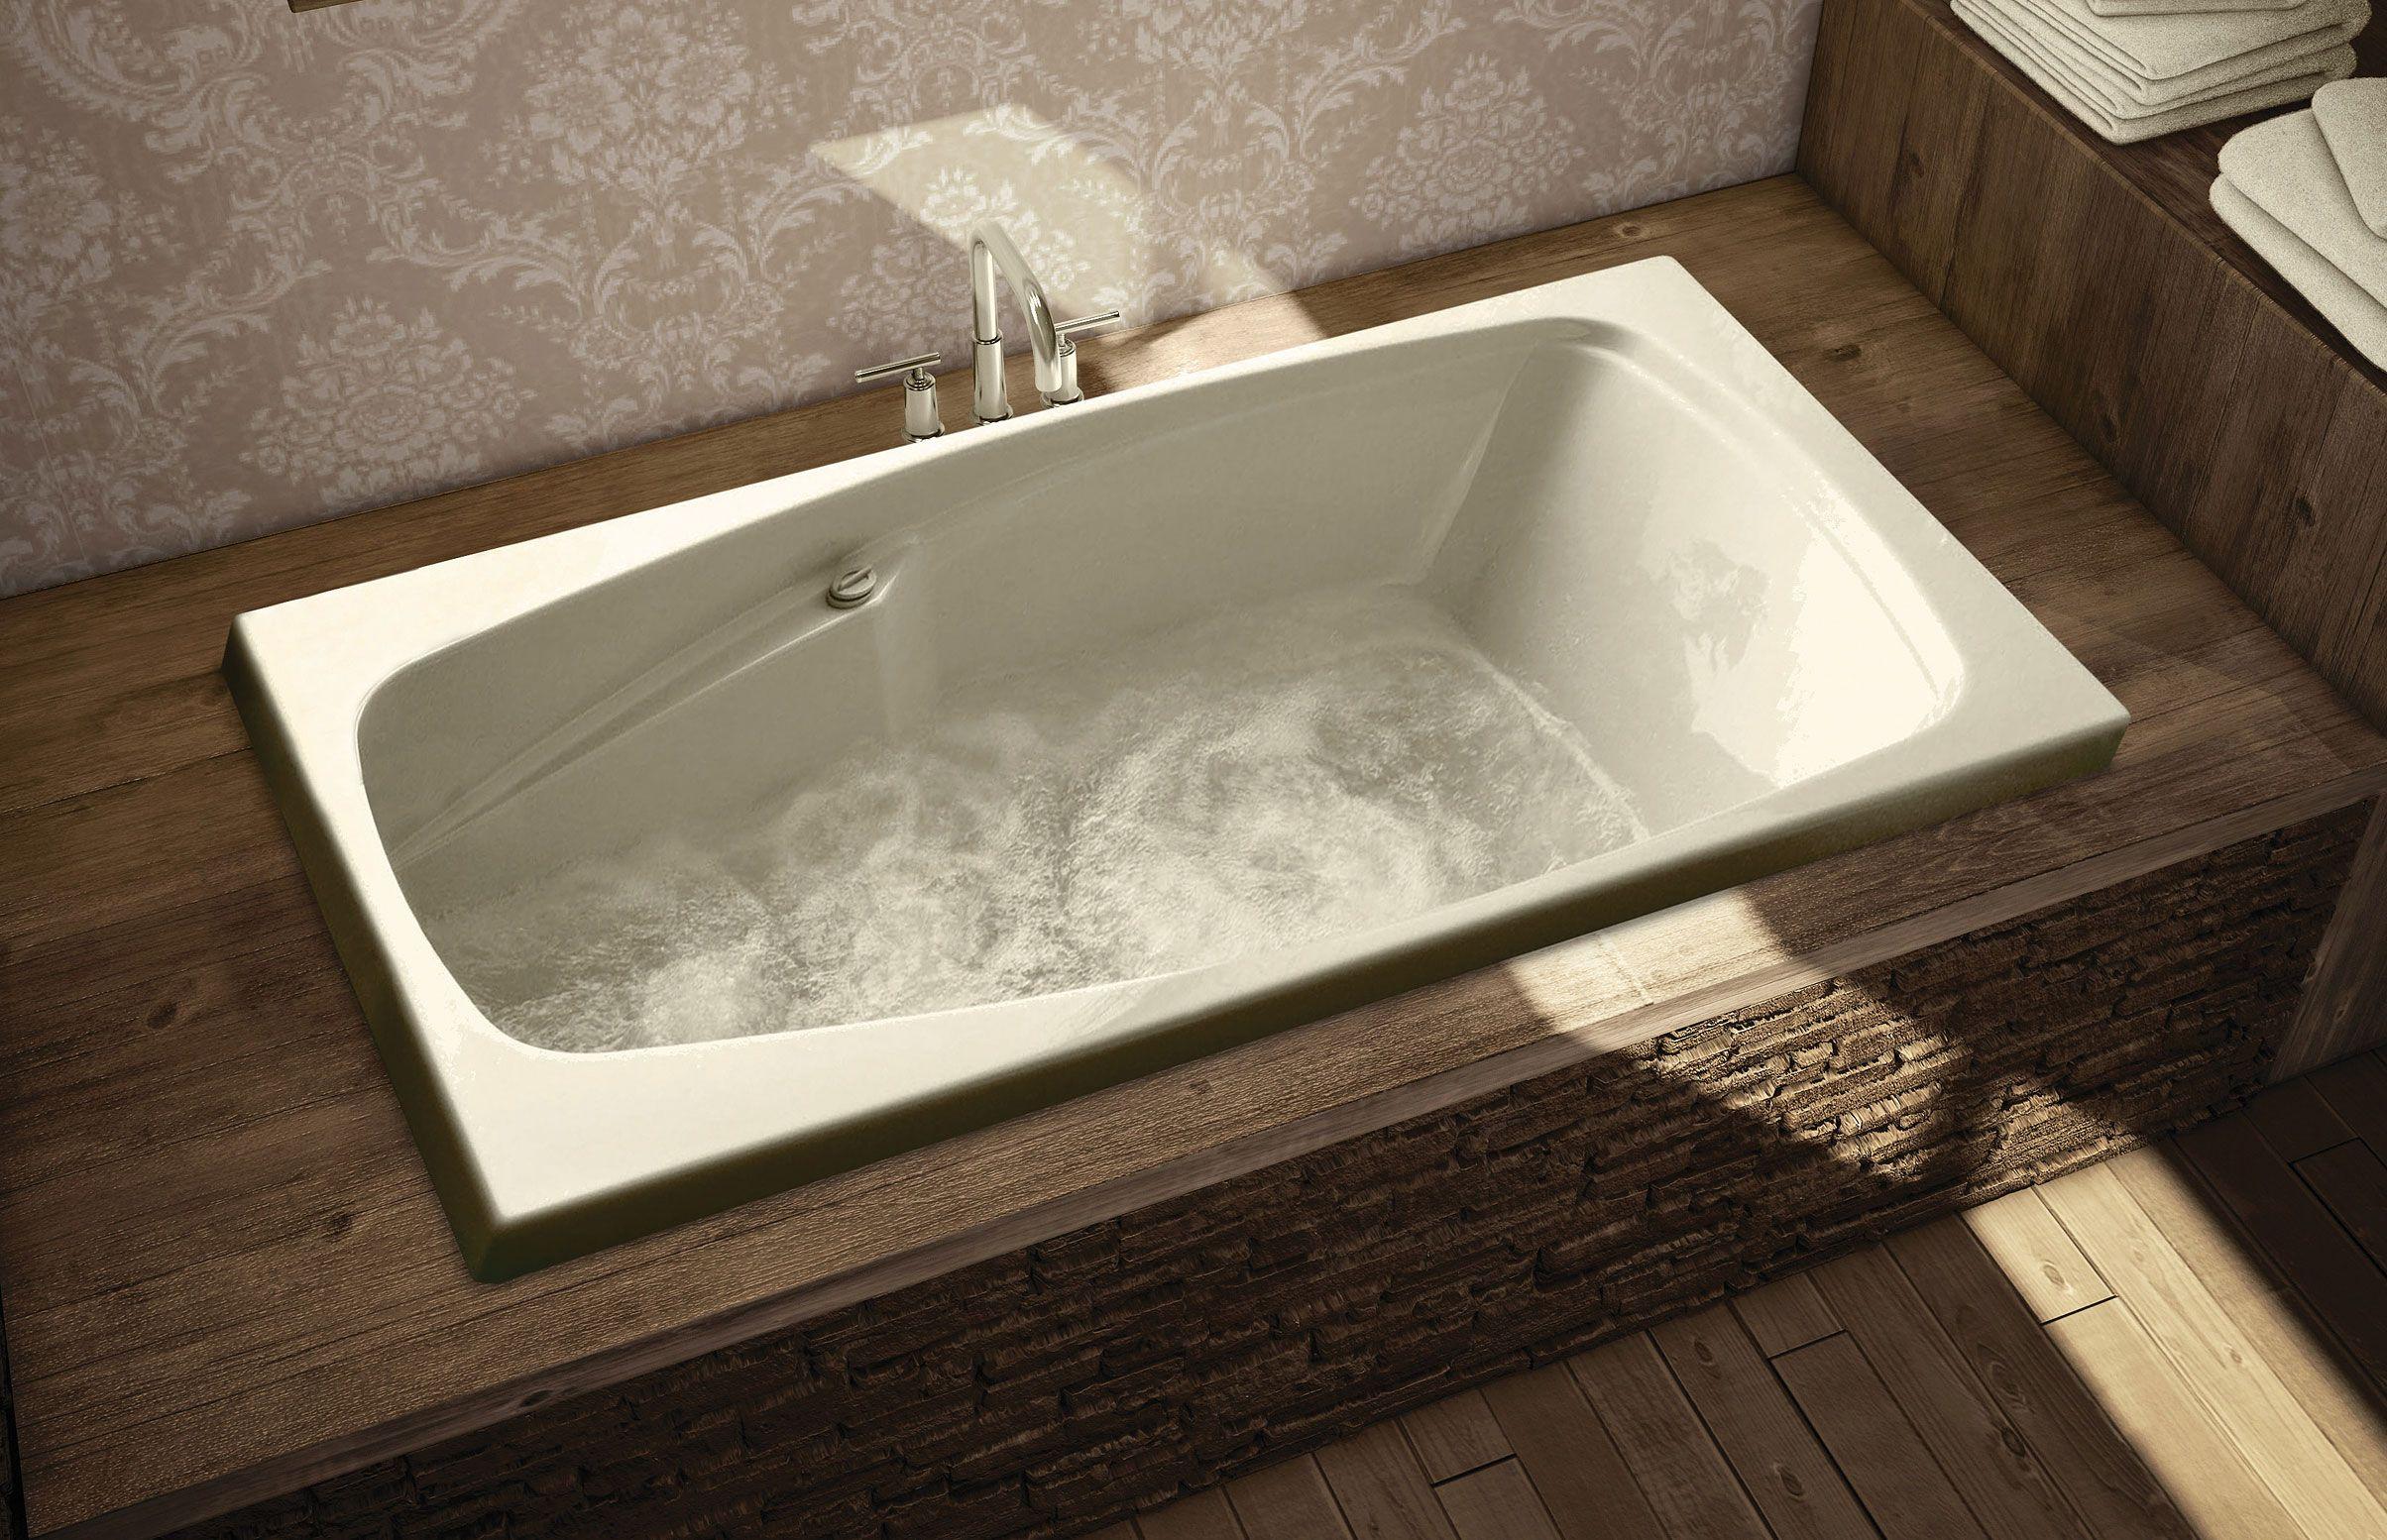 SIMPLICITE Alcove or Drop-in bathtub - MAAX Professional | Bathroom ...